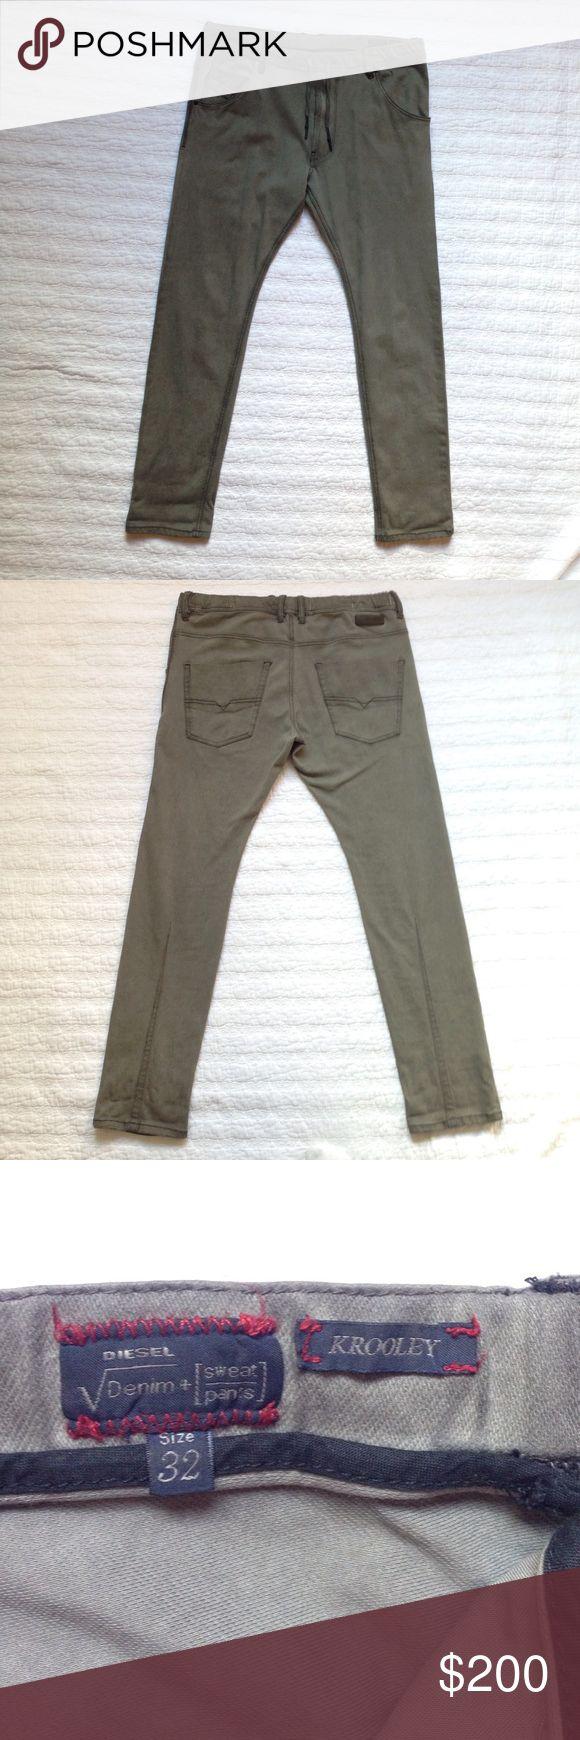 DIESEL DIESEL VDENIM + SWEAT-PANTS. KROOLEY. SIZE 32. NEW W/O TAGS. MADE IN ITALY Diesel Pants Sweatpants & Joggers